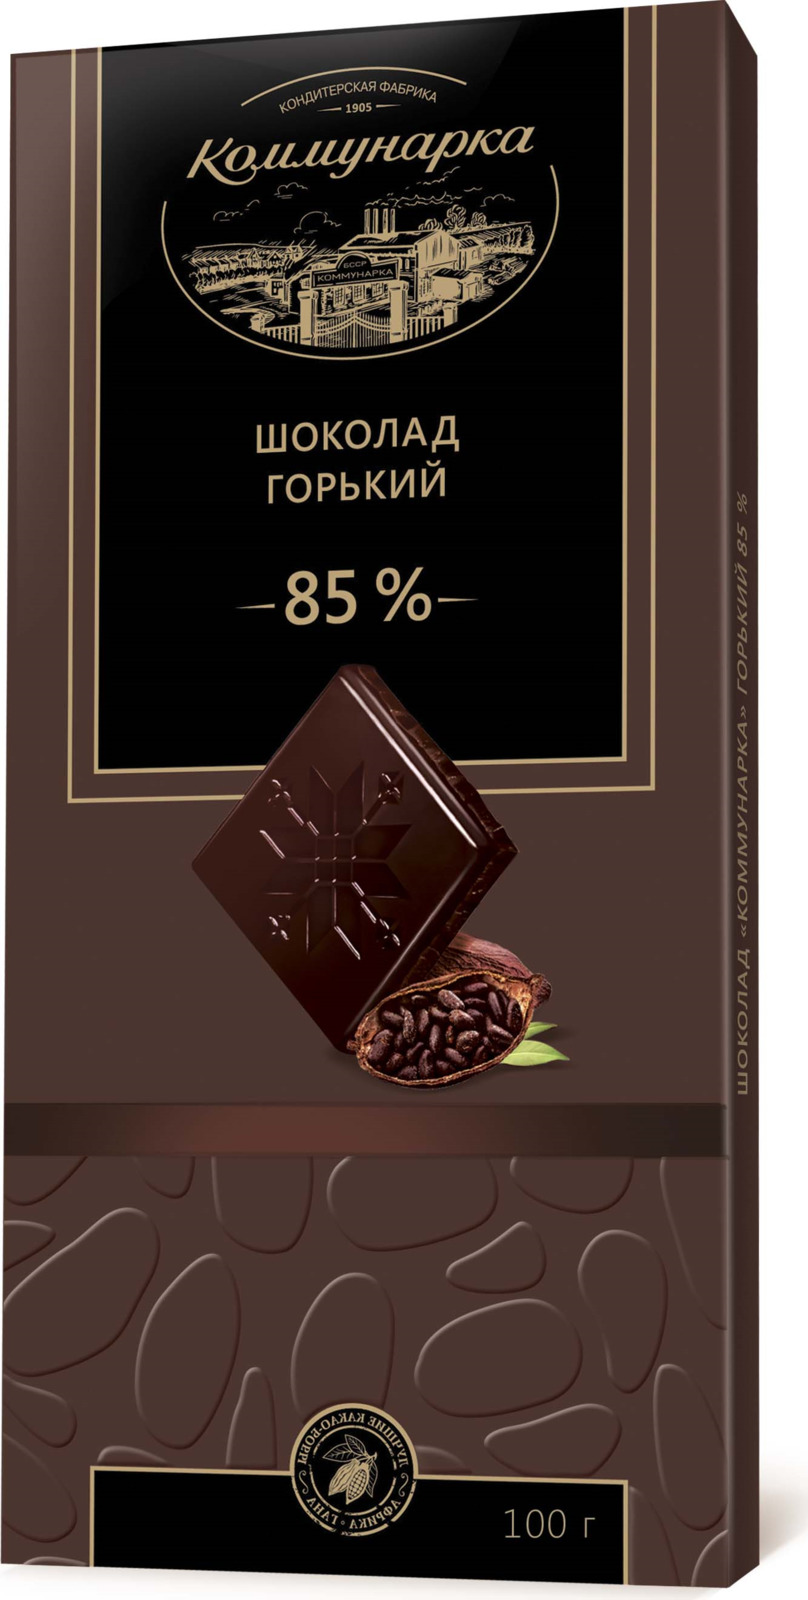 Шоколад Коммунарка, горький 85%, 100 г цена 2017